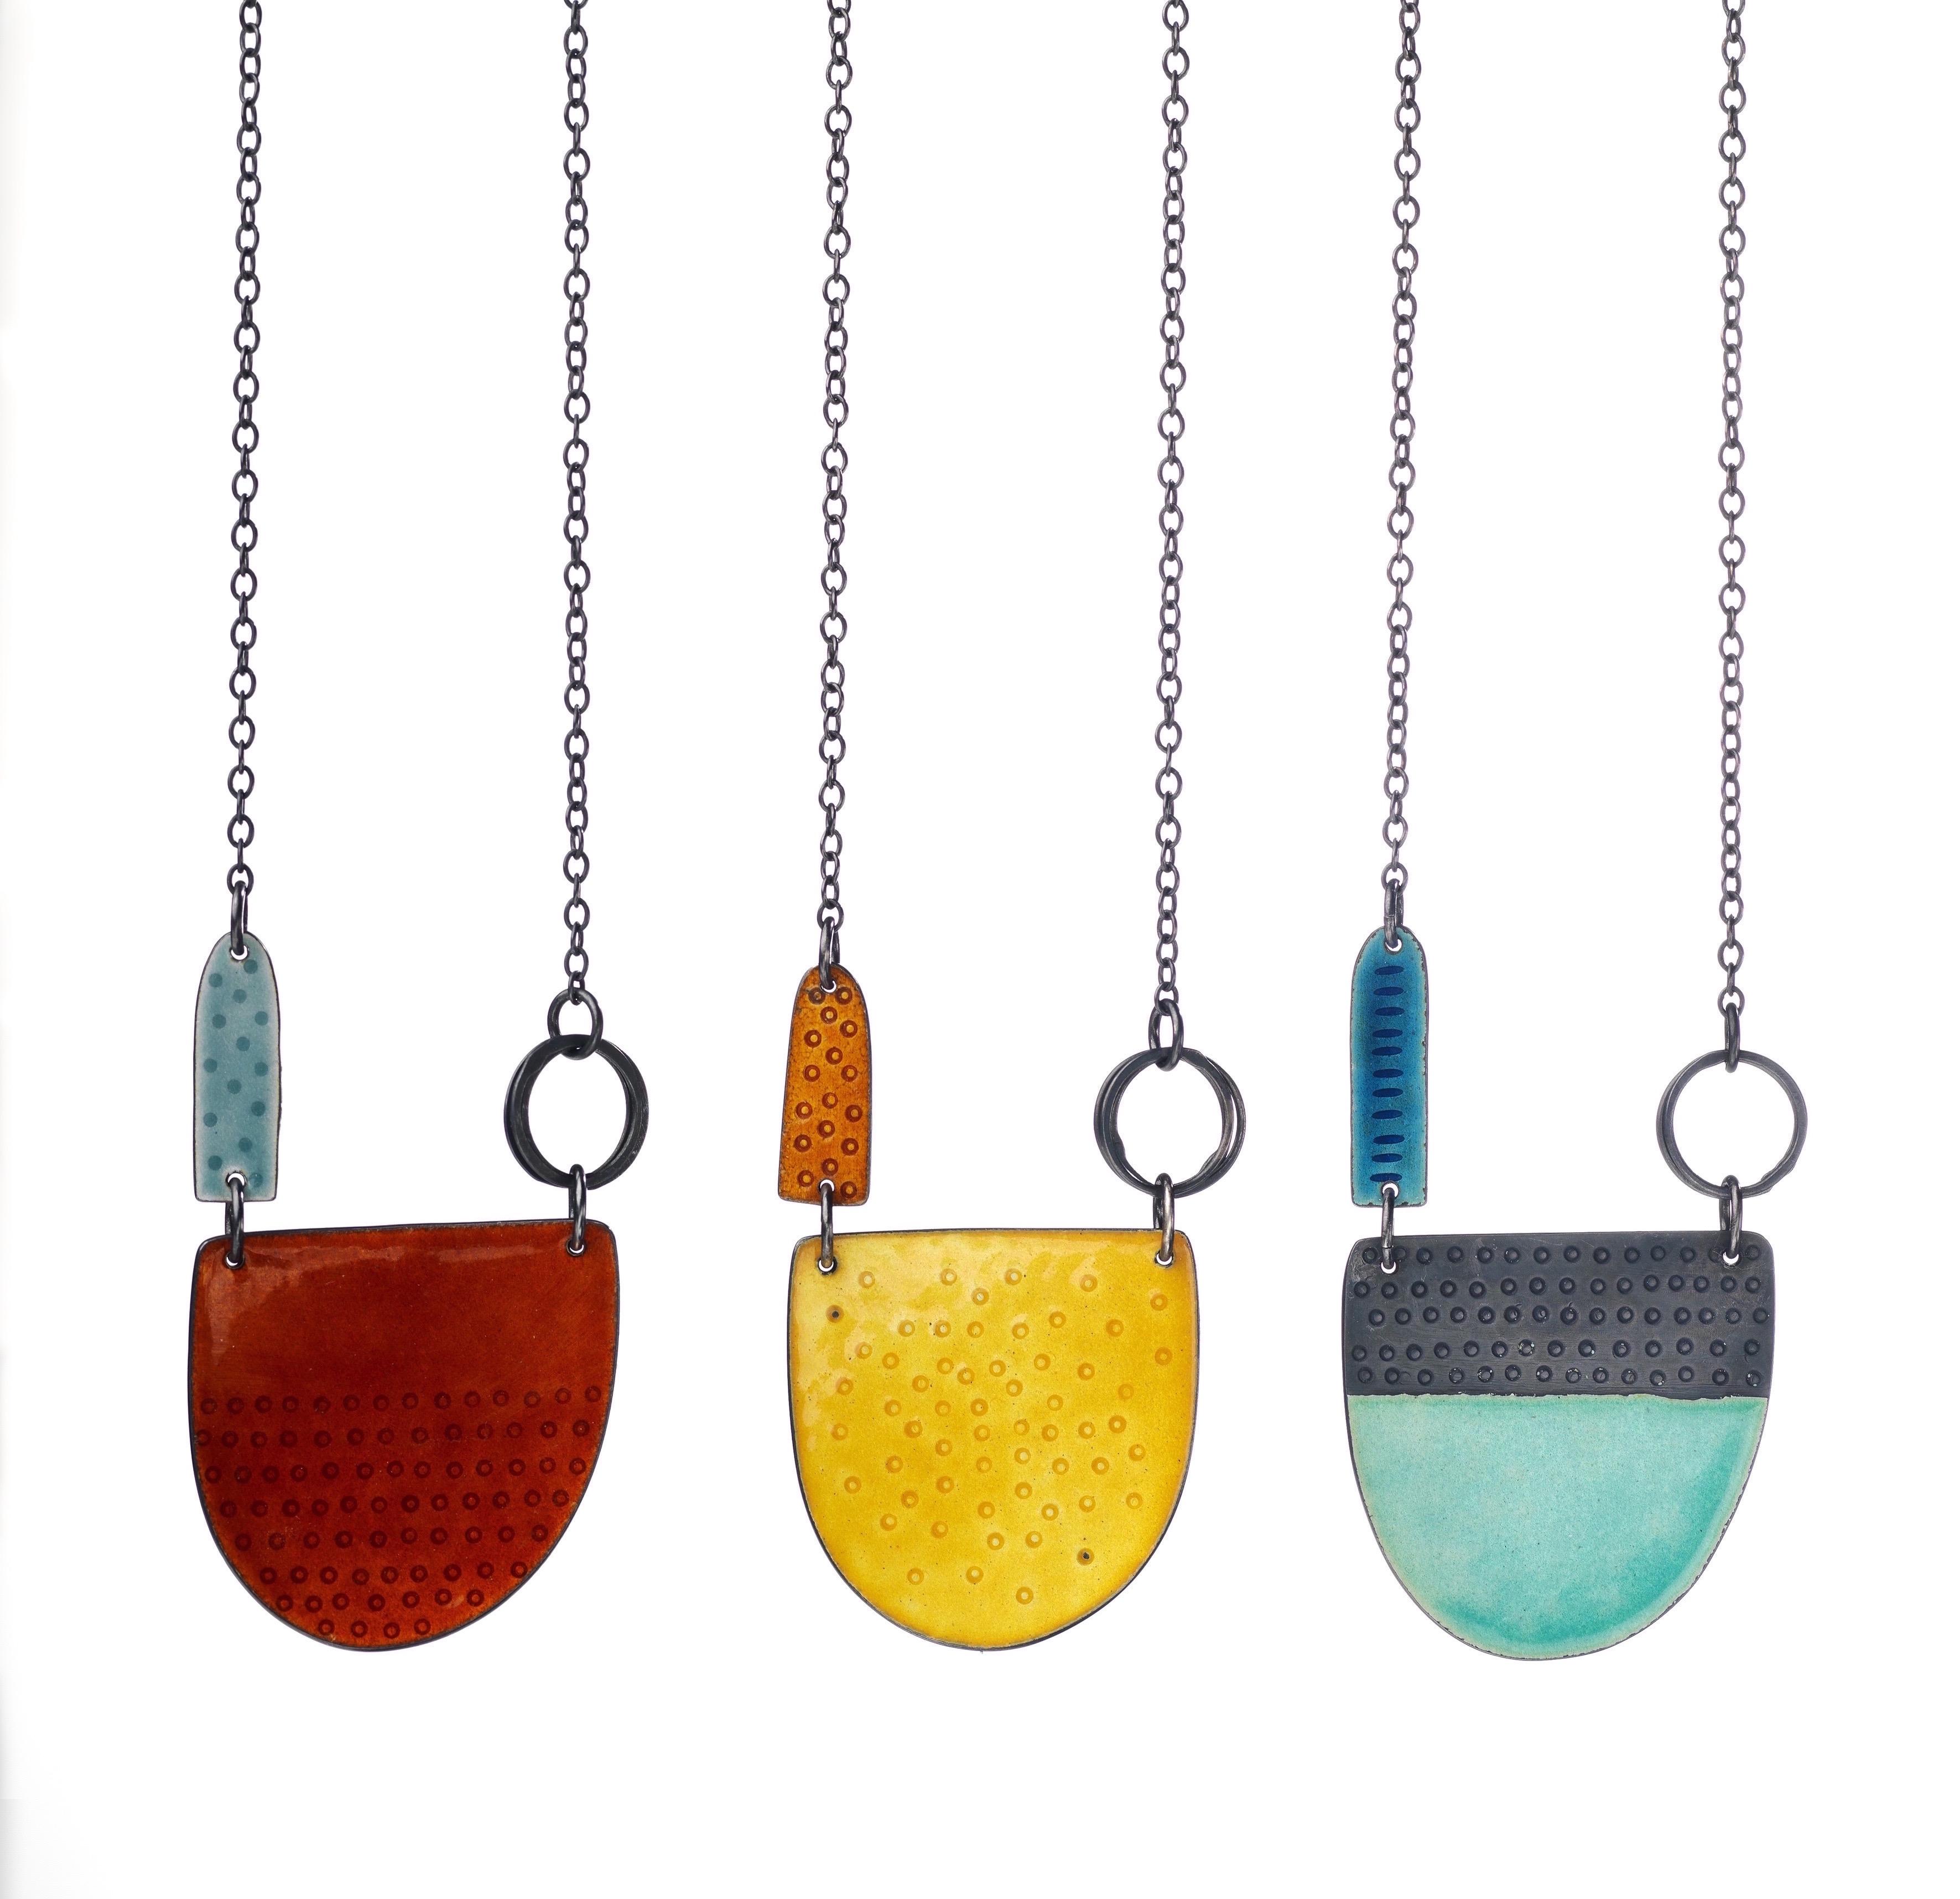 Tidal series neckpieces - silver & enamel